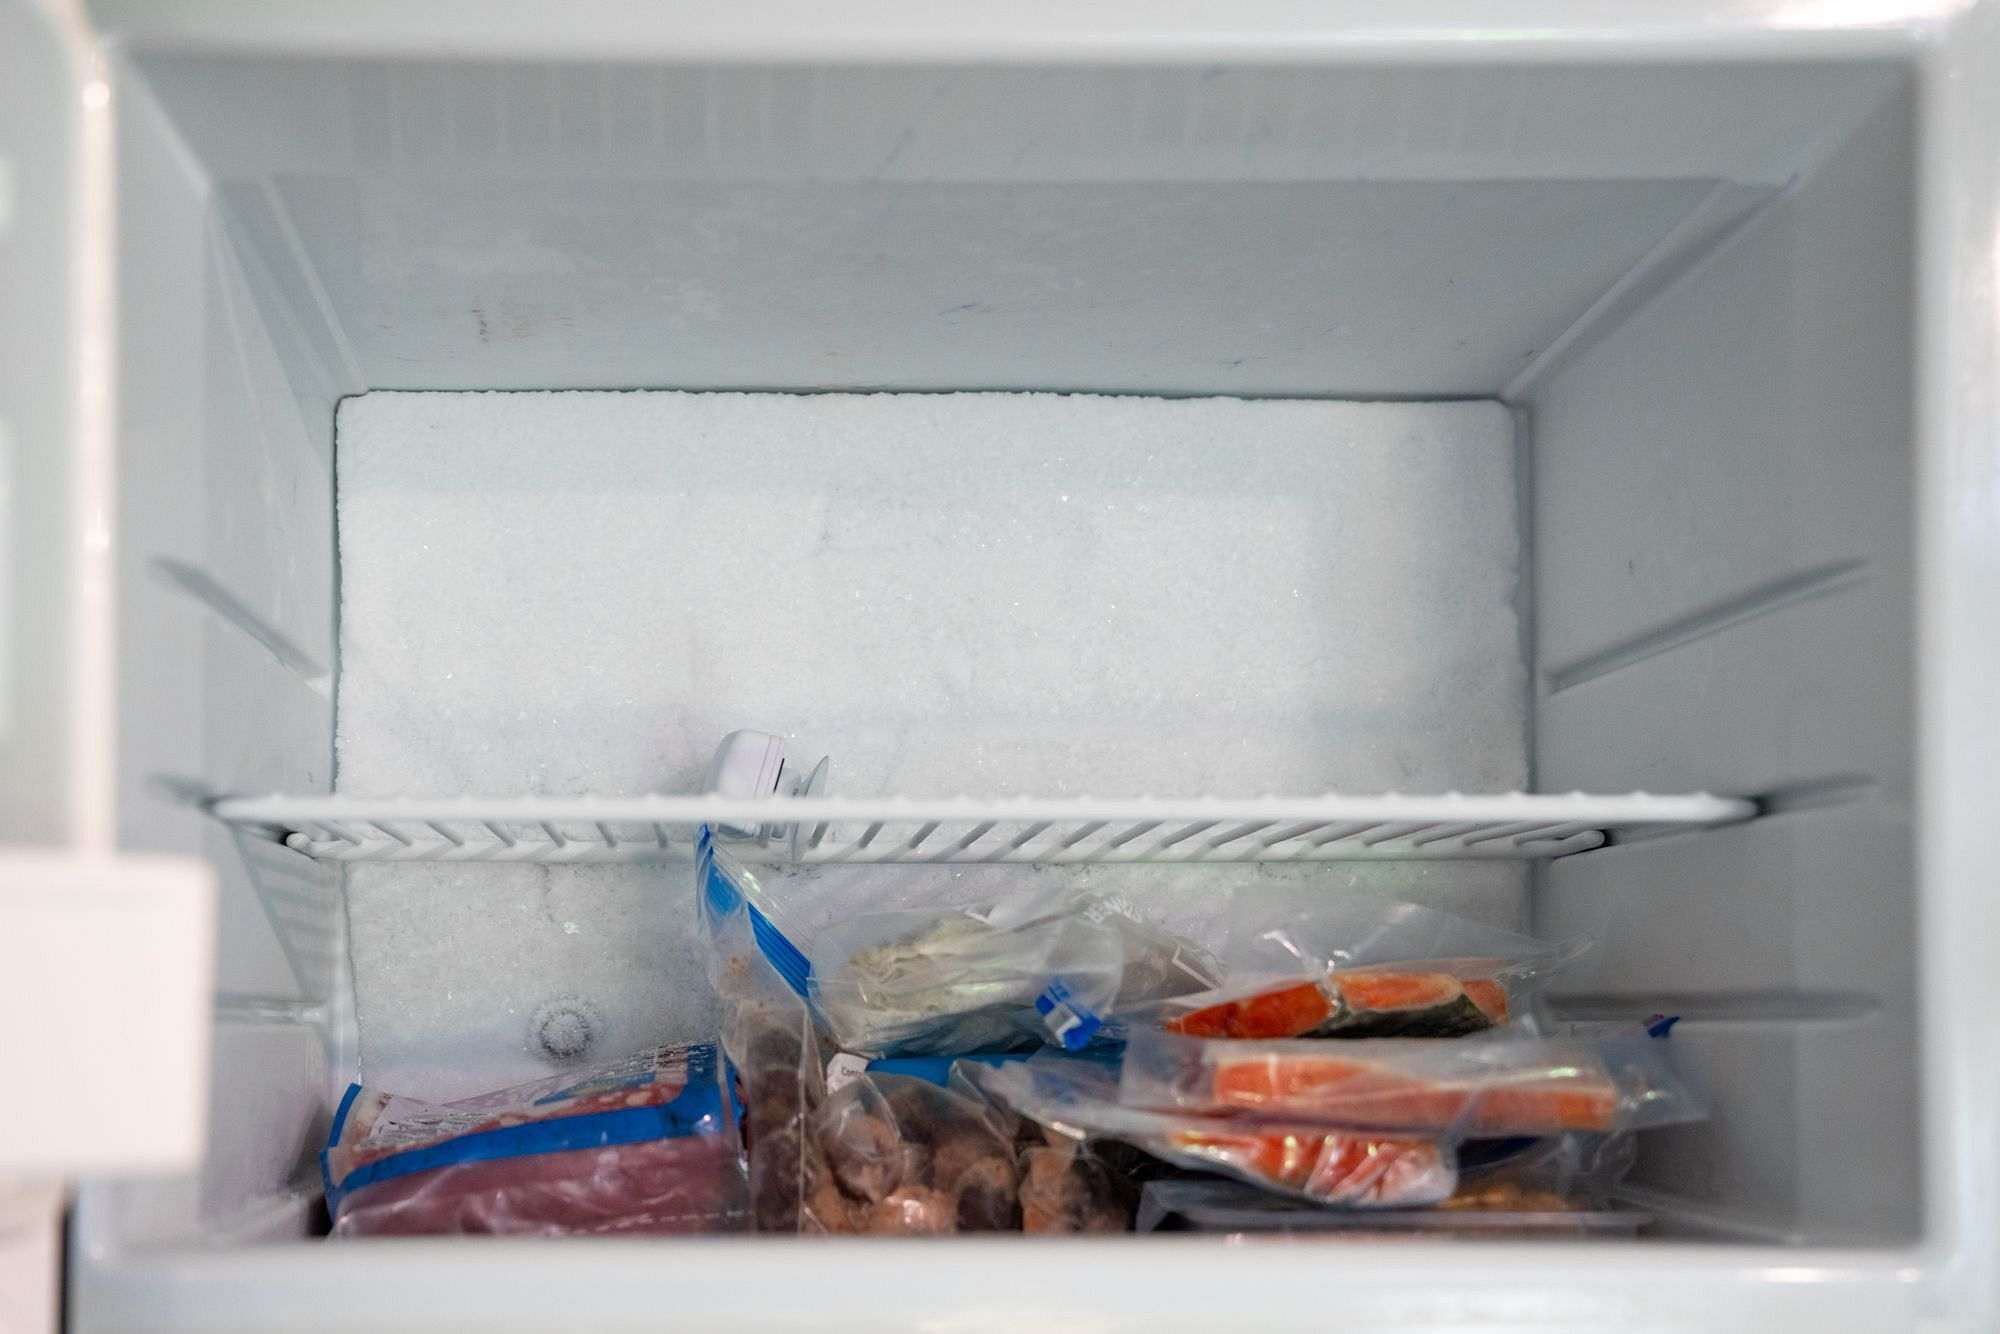 RV Freezer Ice Buildup